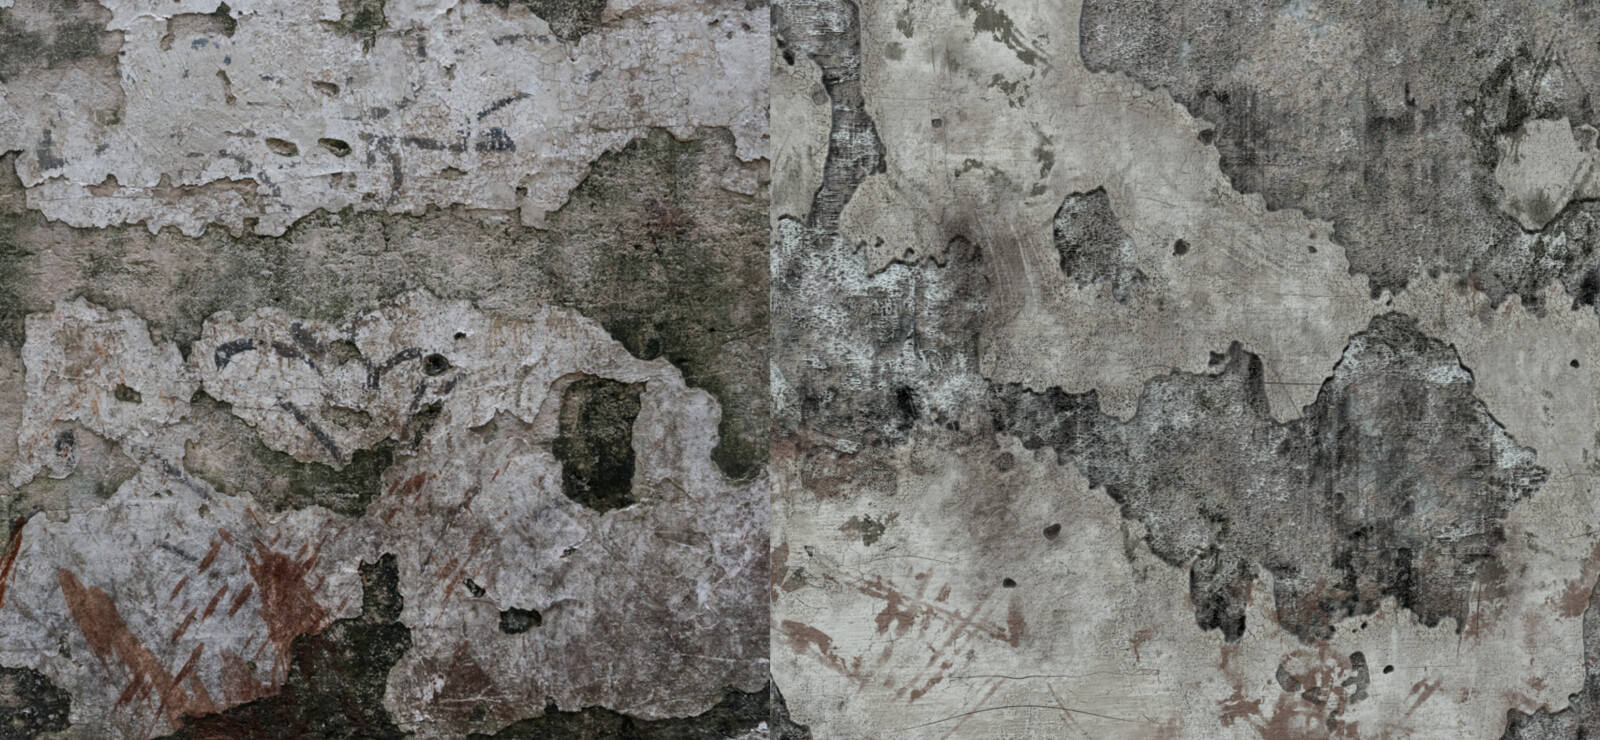 Reference vs material comparison